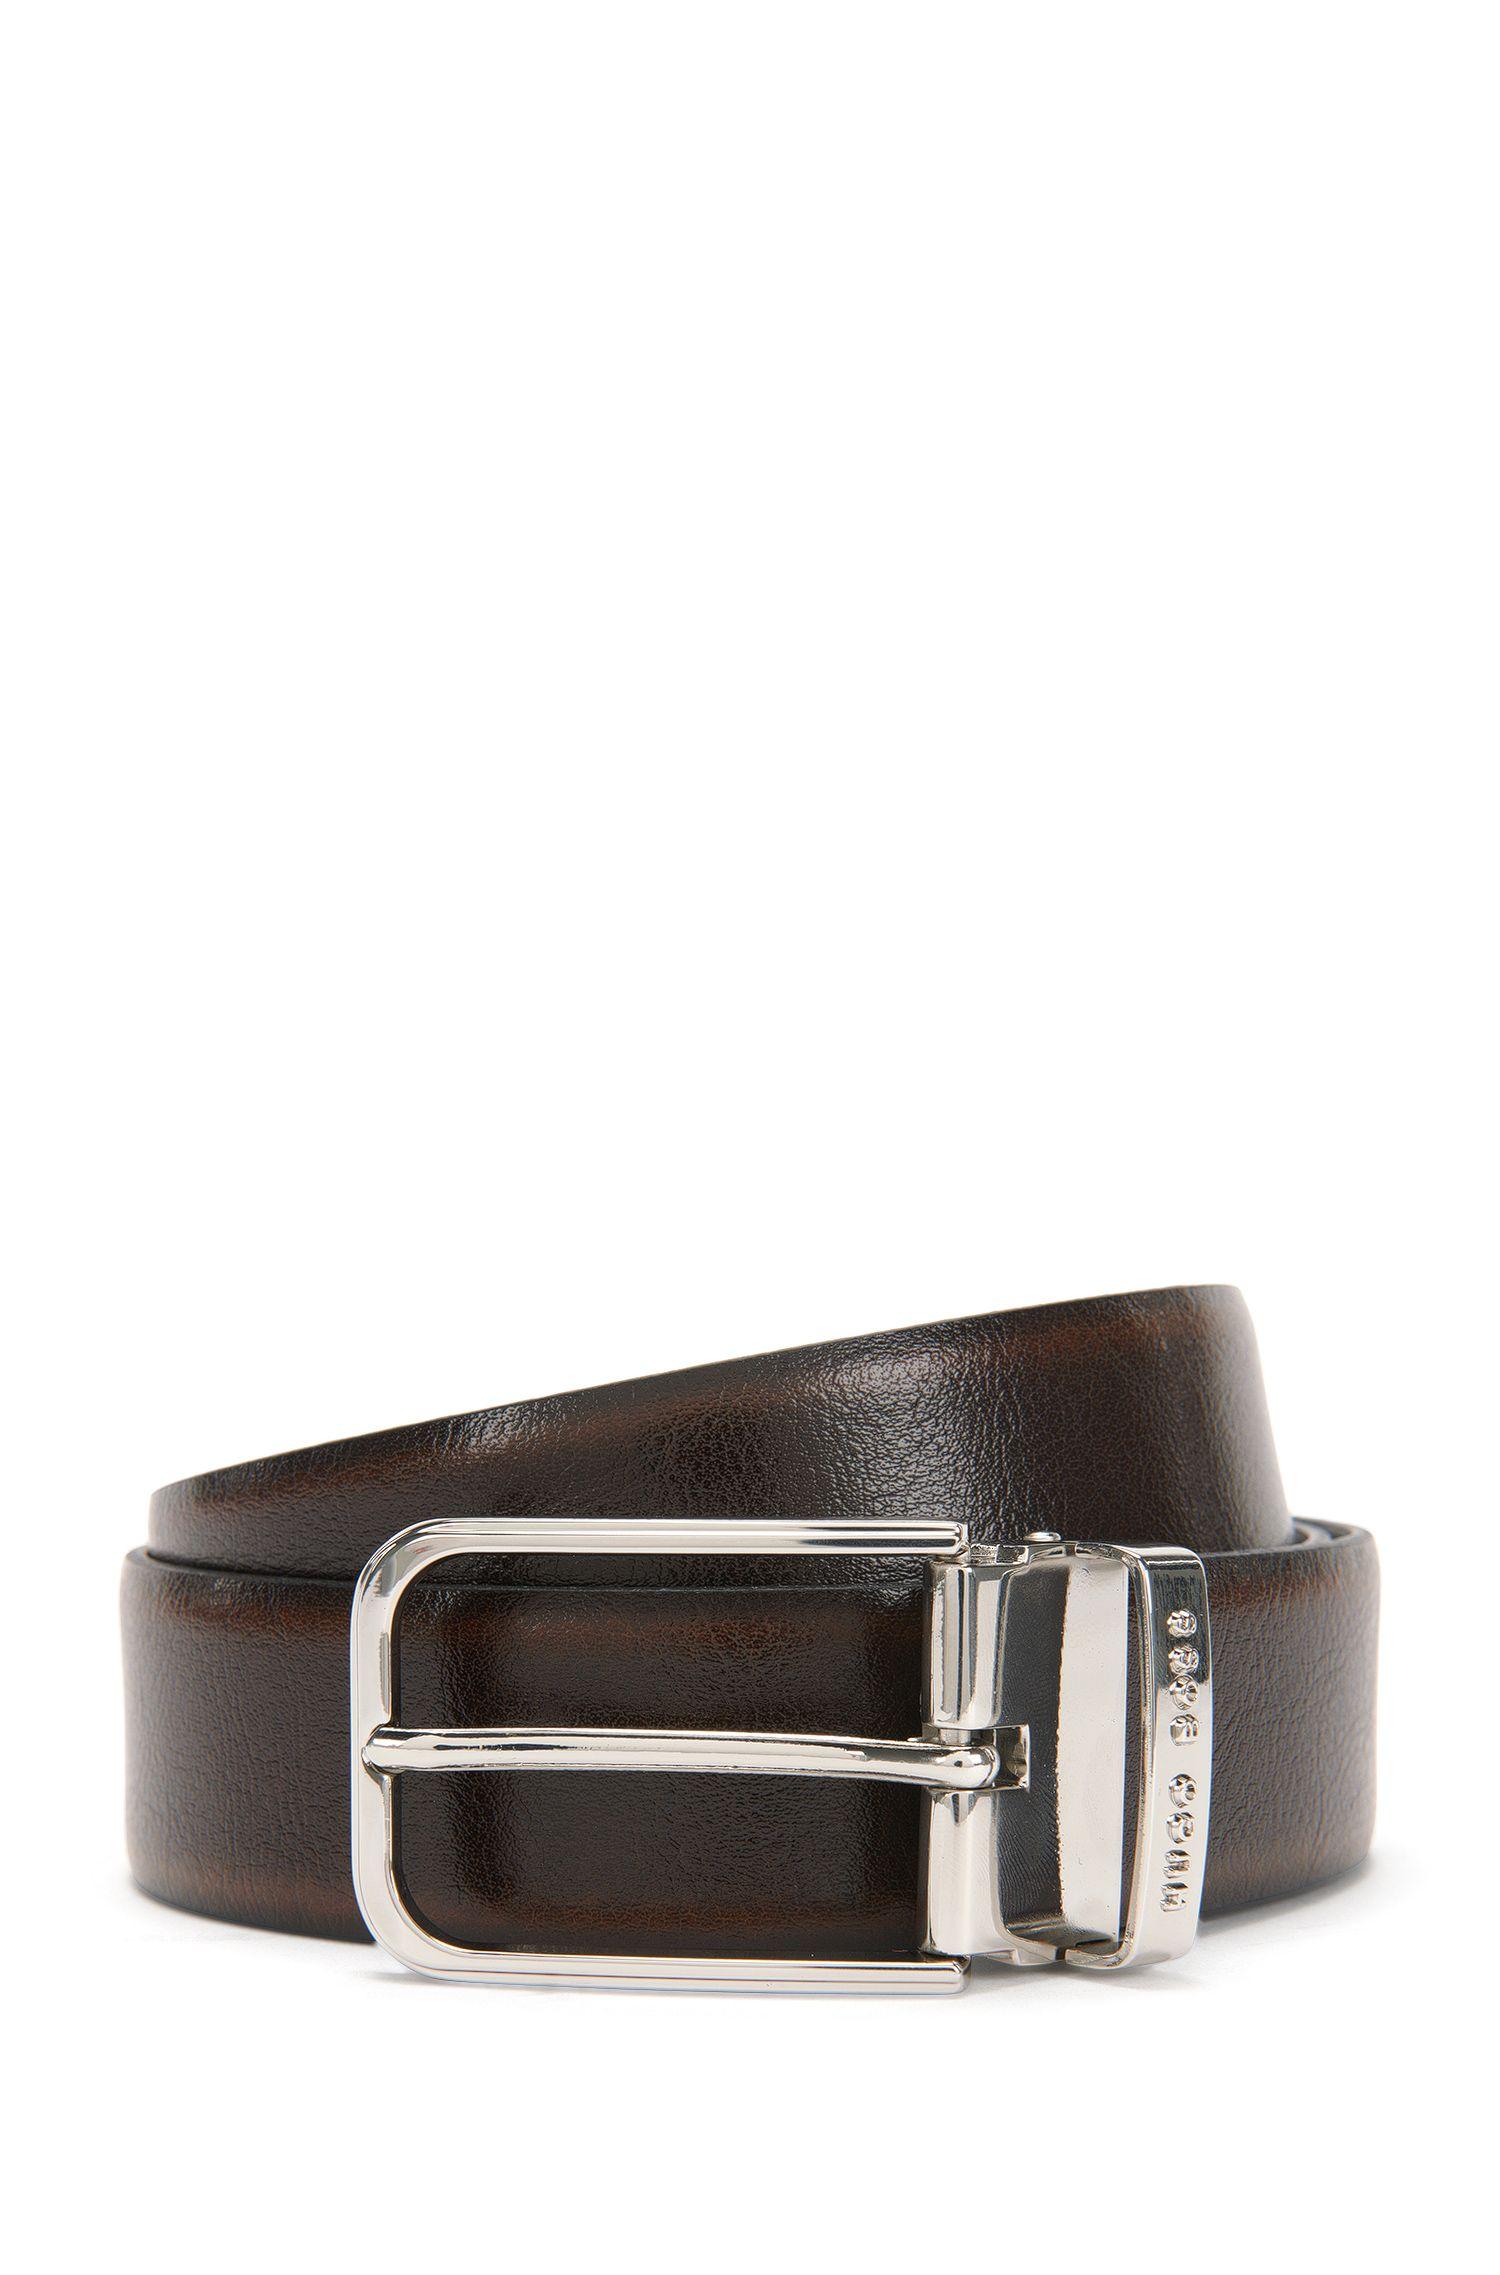 'Garlef Gb35 Ps' | Reversible Italian Leather Belt